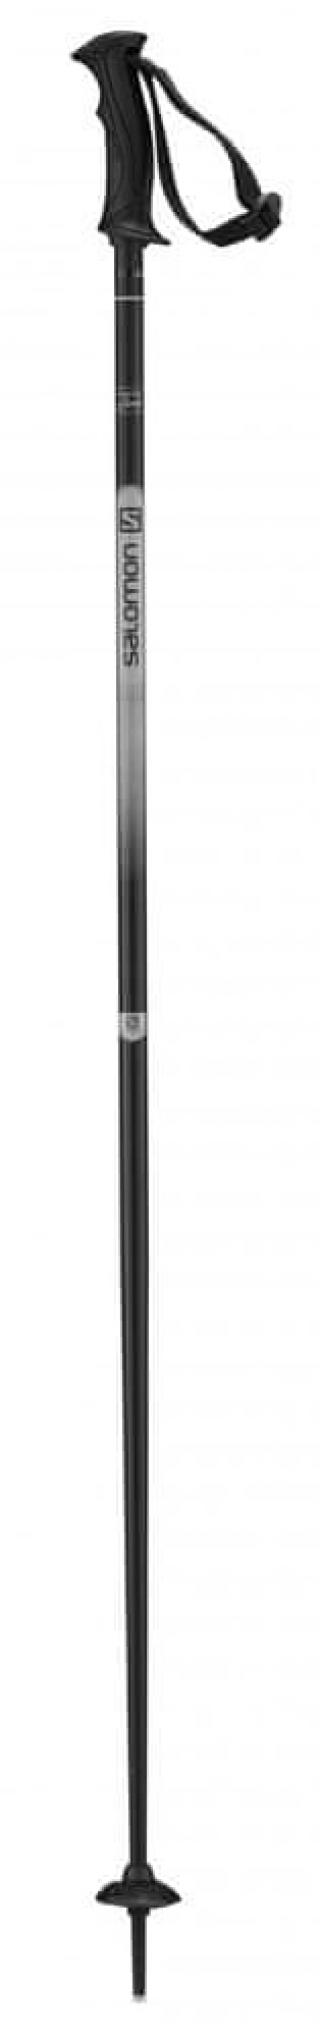 Salomon Northpole Lady Black 115 cm - rozbaleno